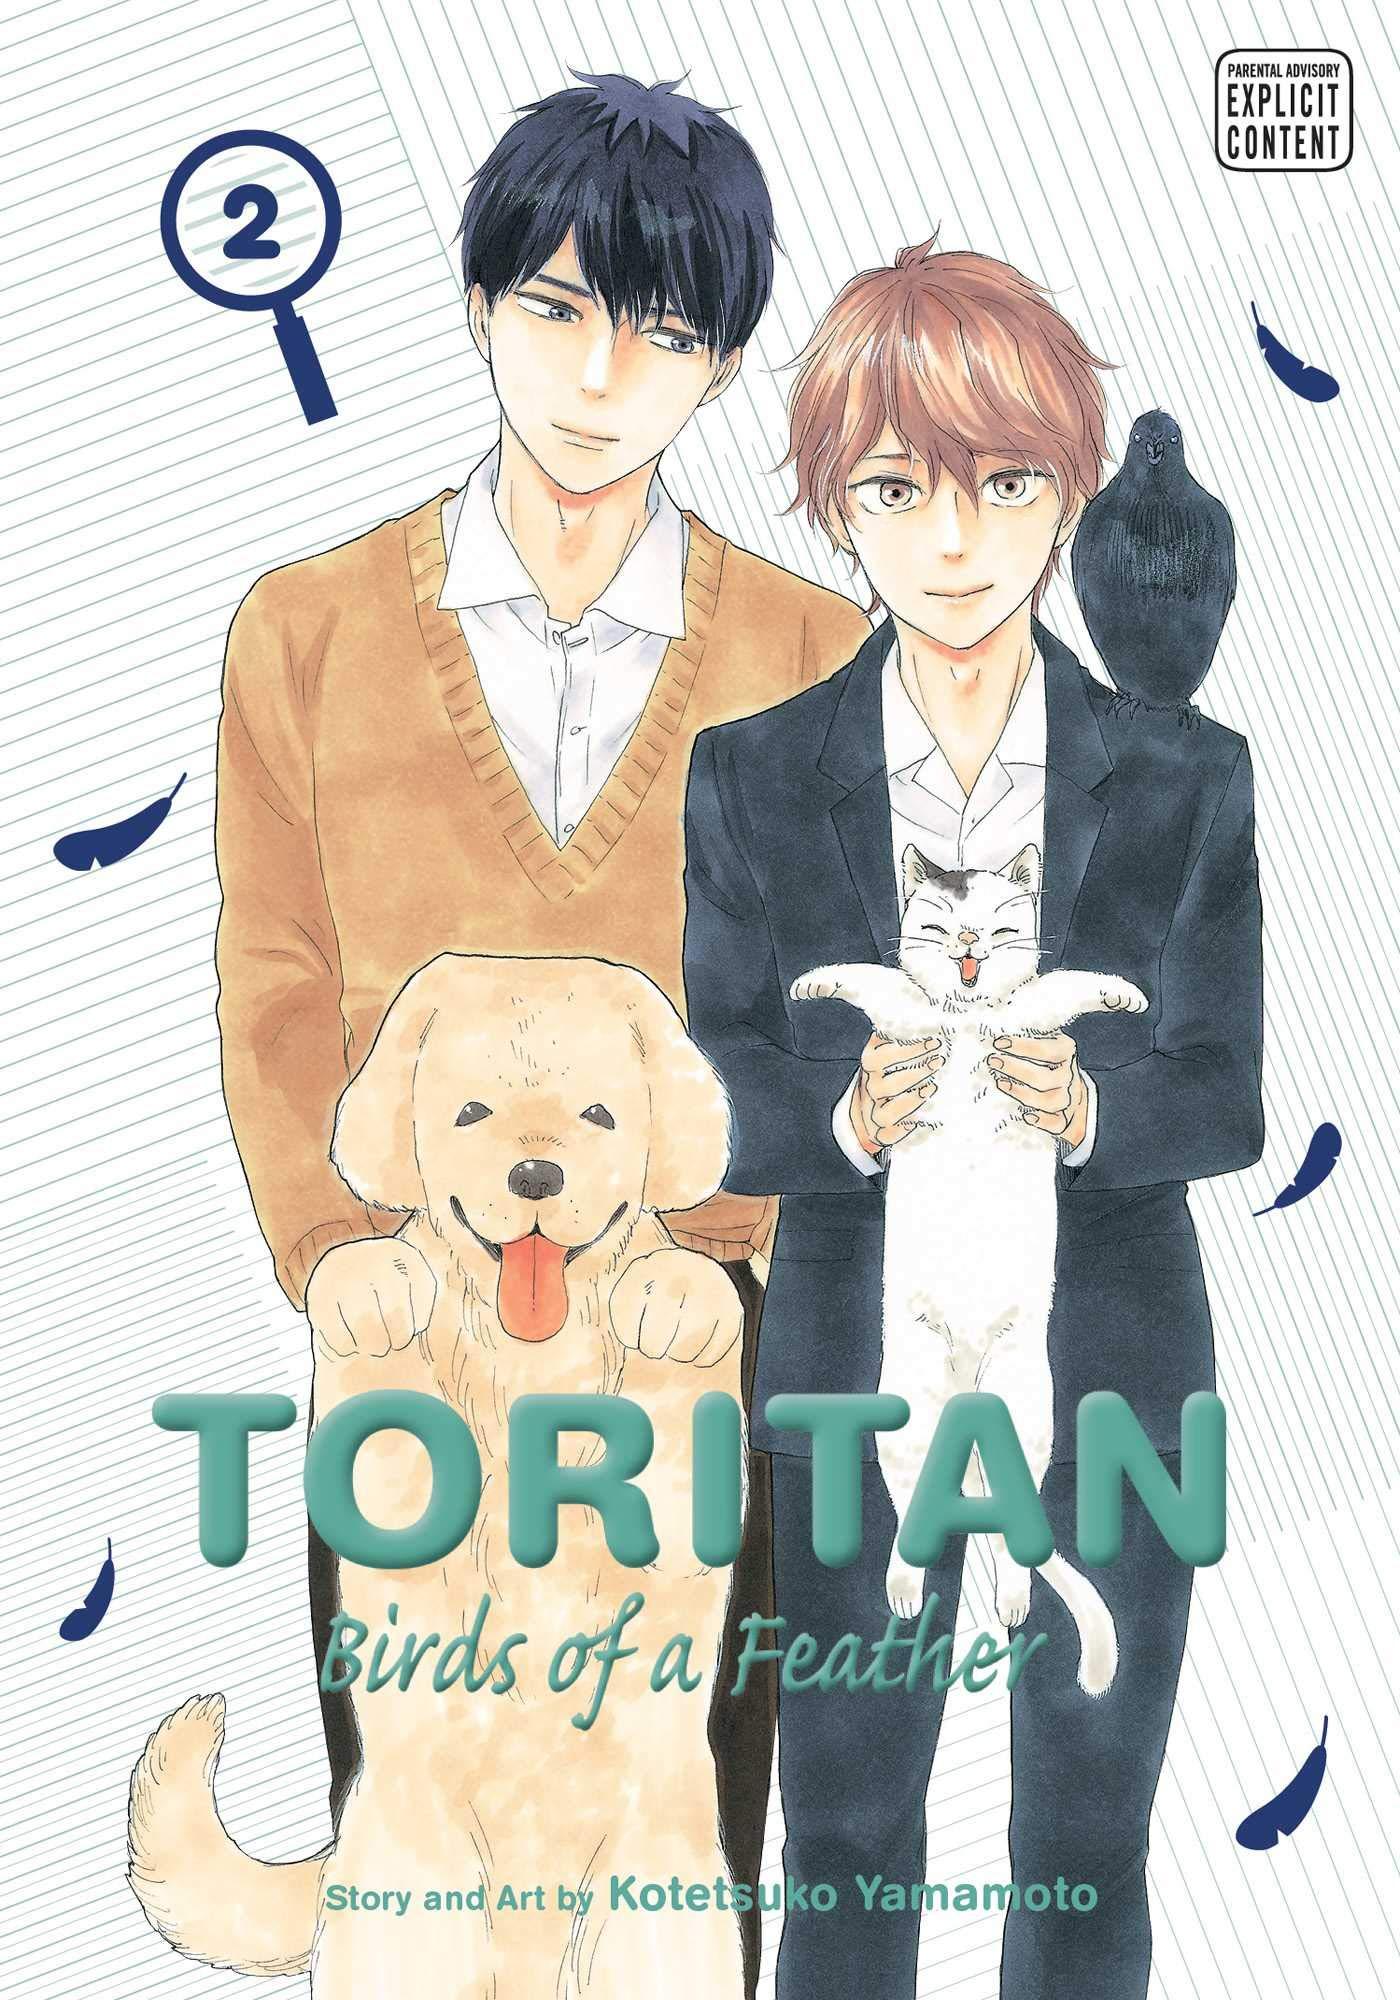 Toritan: Birds of a Feather - Volume 2